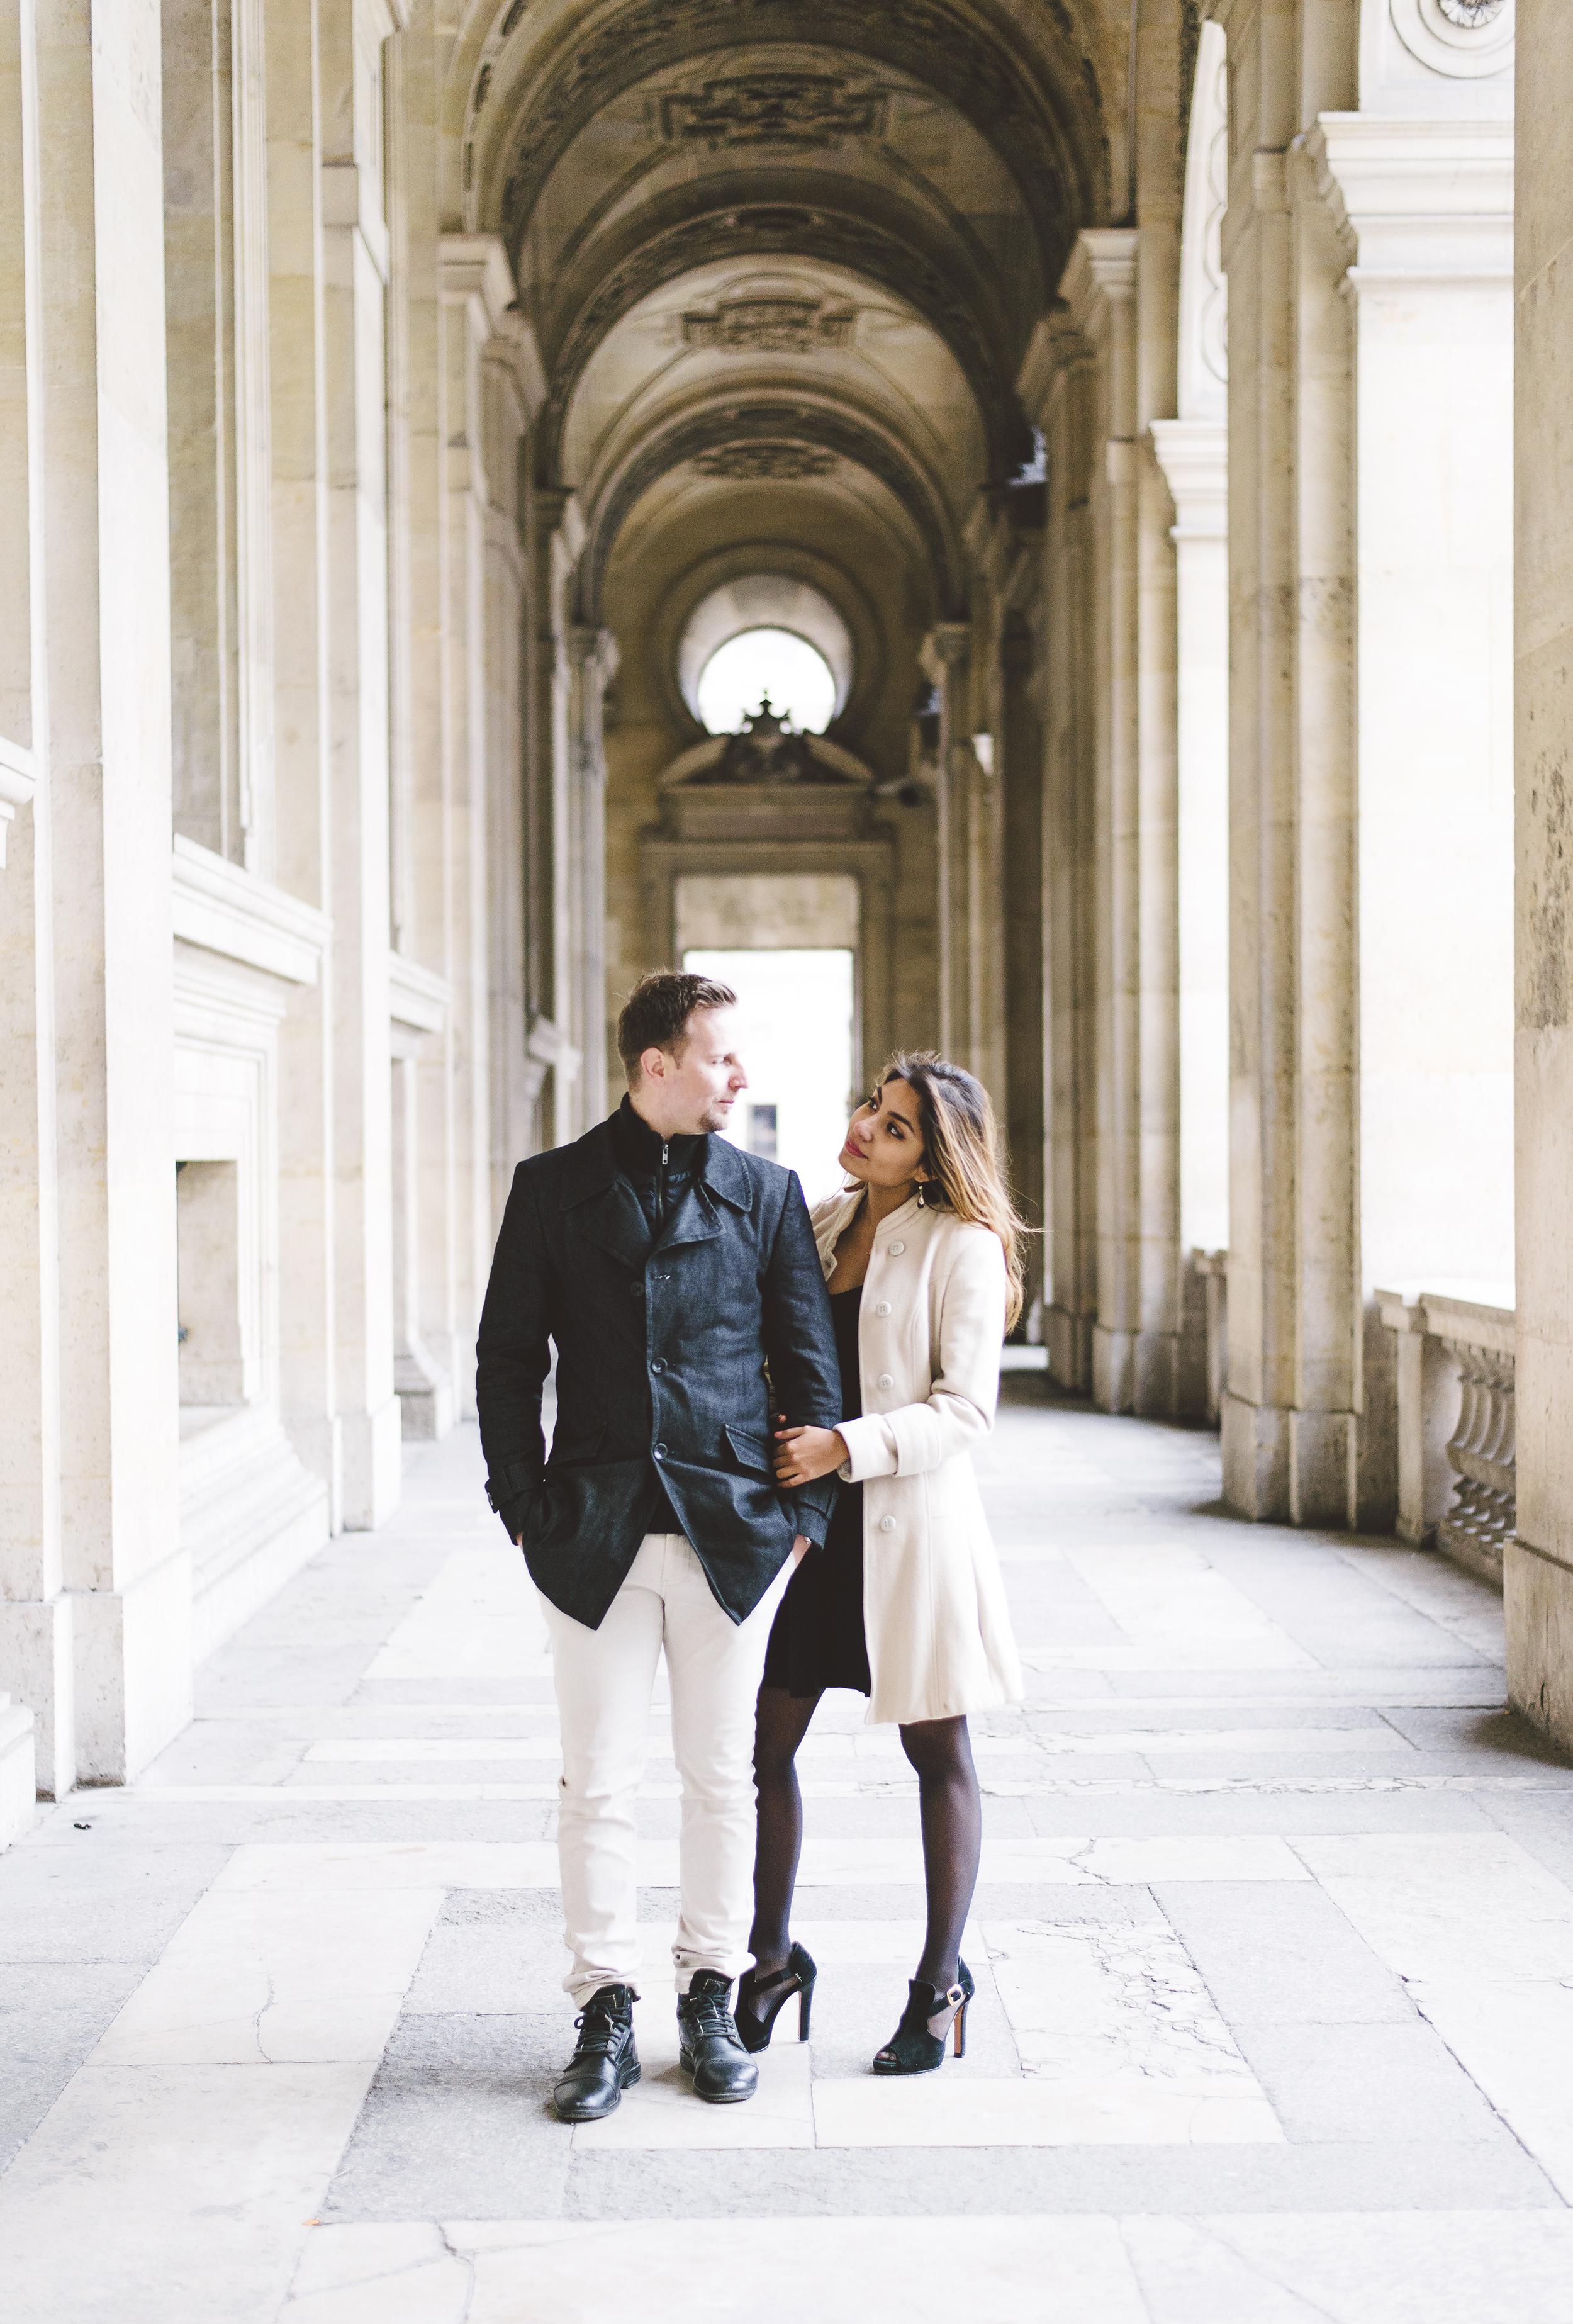 Couple-photoshoot-Anniversary-Paris-Louvre-Tuileries108.jpg